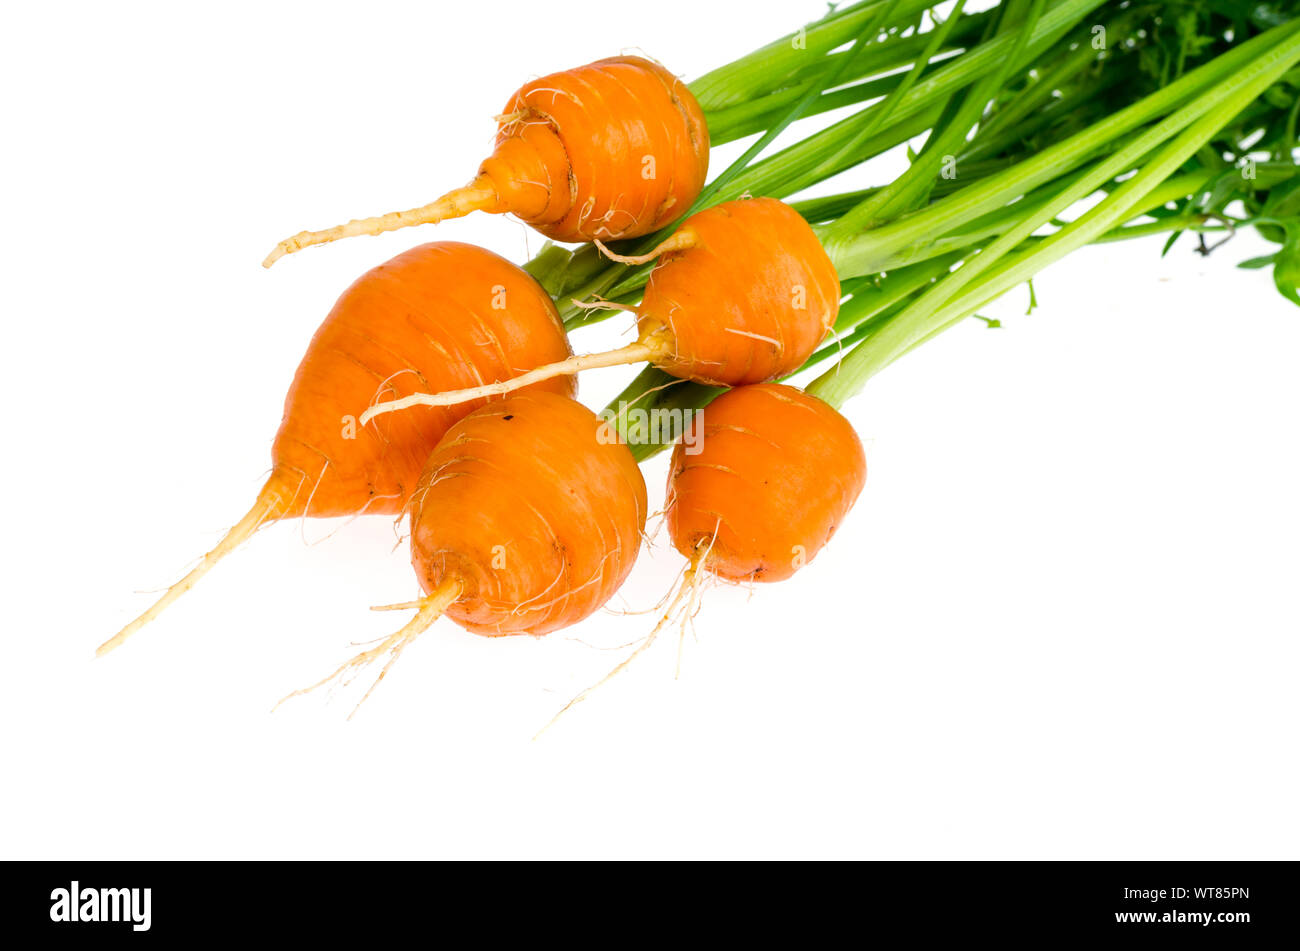 Just harvested Round romeo carrots, isolated on white background. Studio Photo Stock Photo